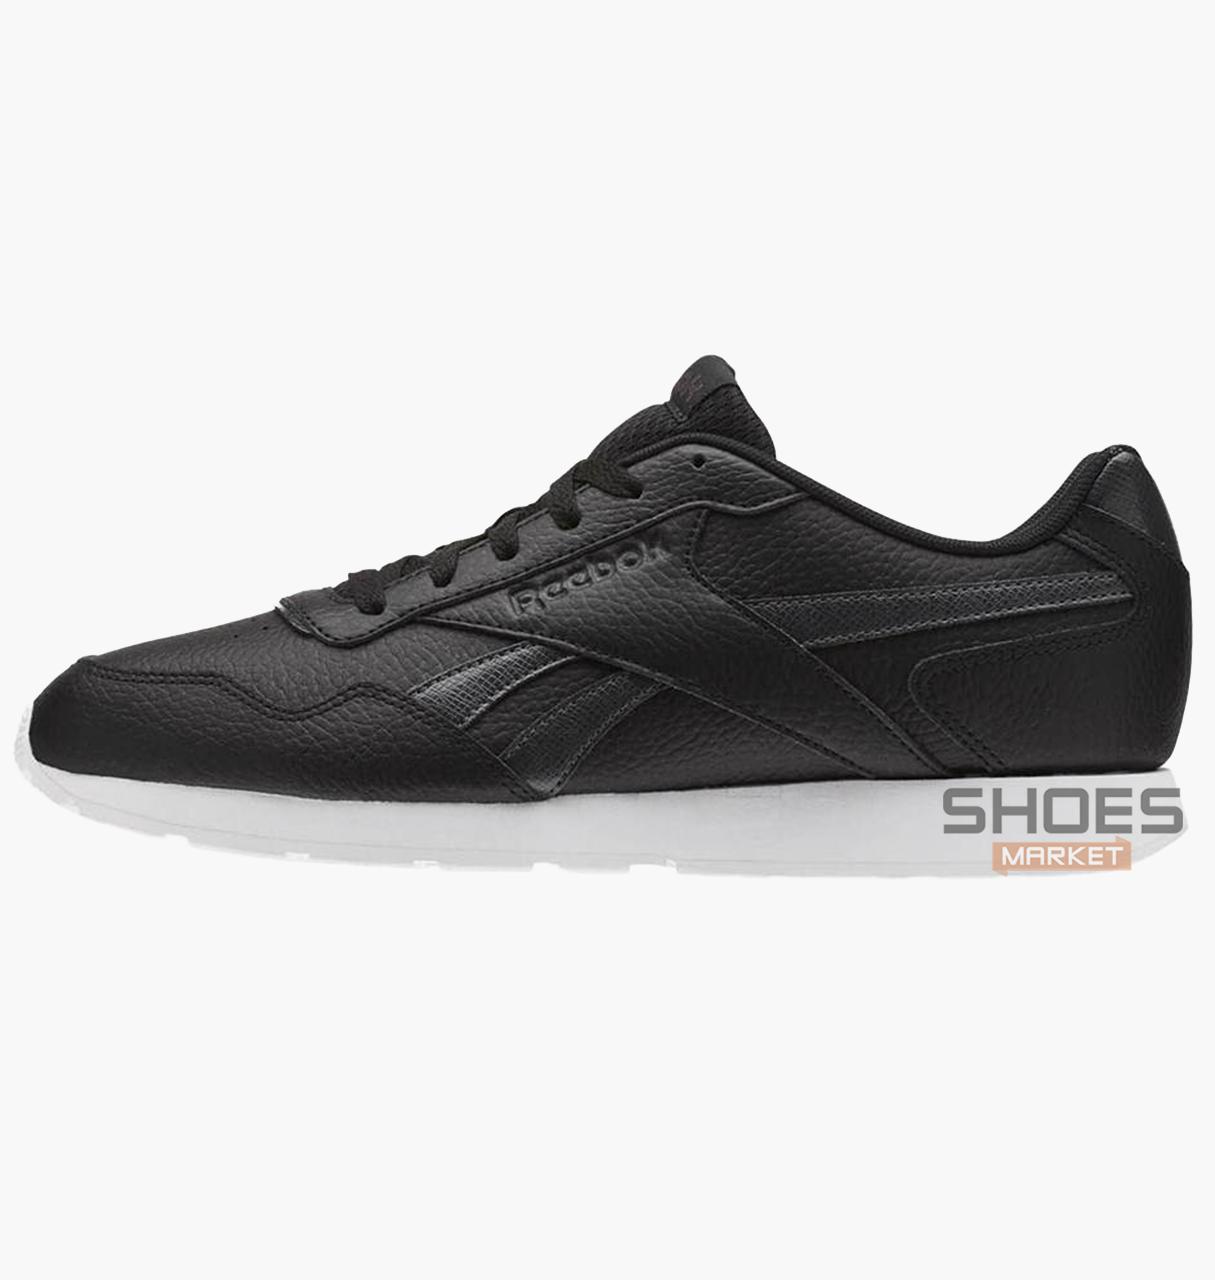 Мужские кроссовки  Reebok Royal Glide  Black CN4561, оригинал